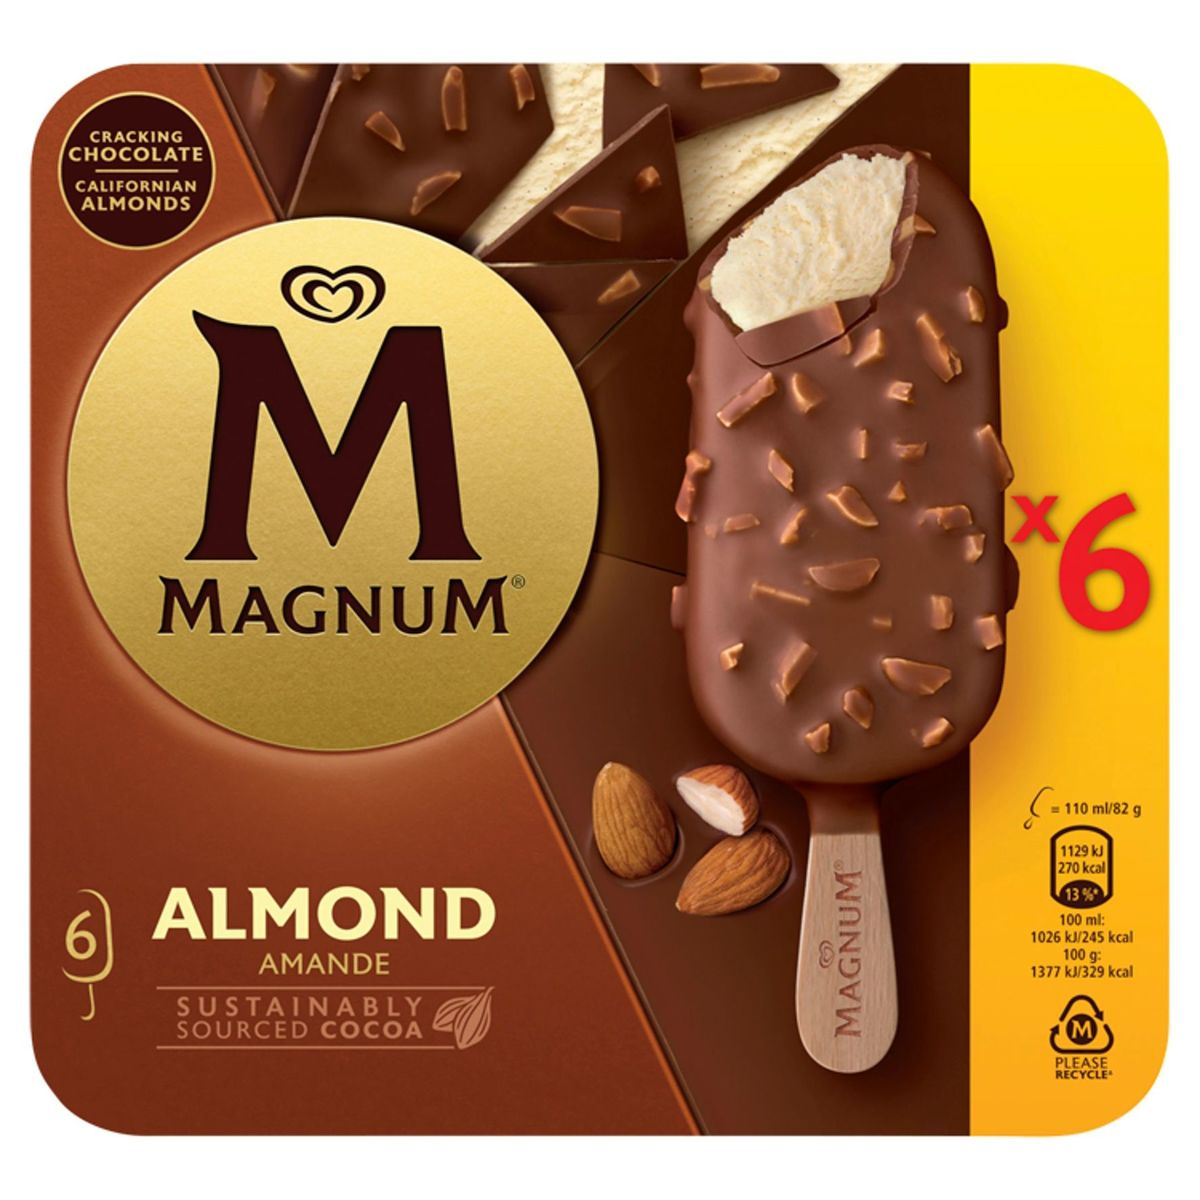 Magnum Ola Ijs Multipack Almond 6 x 110 ml